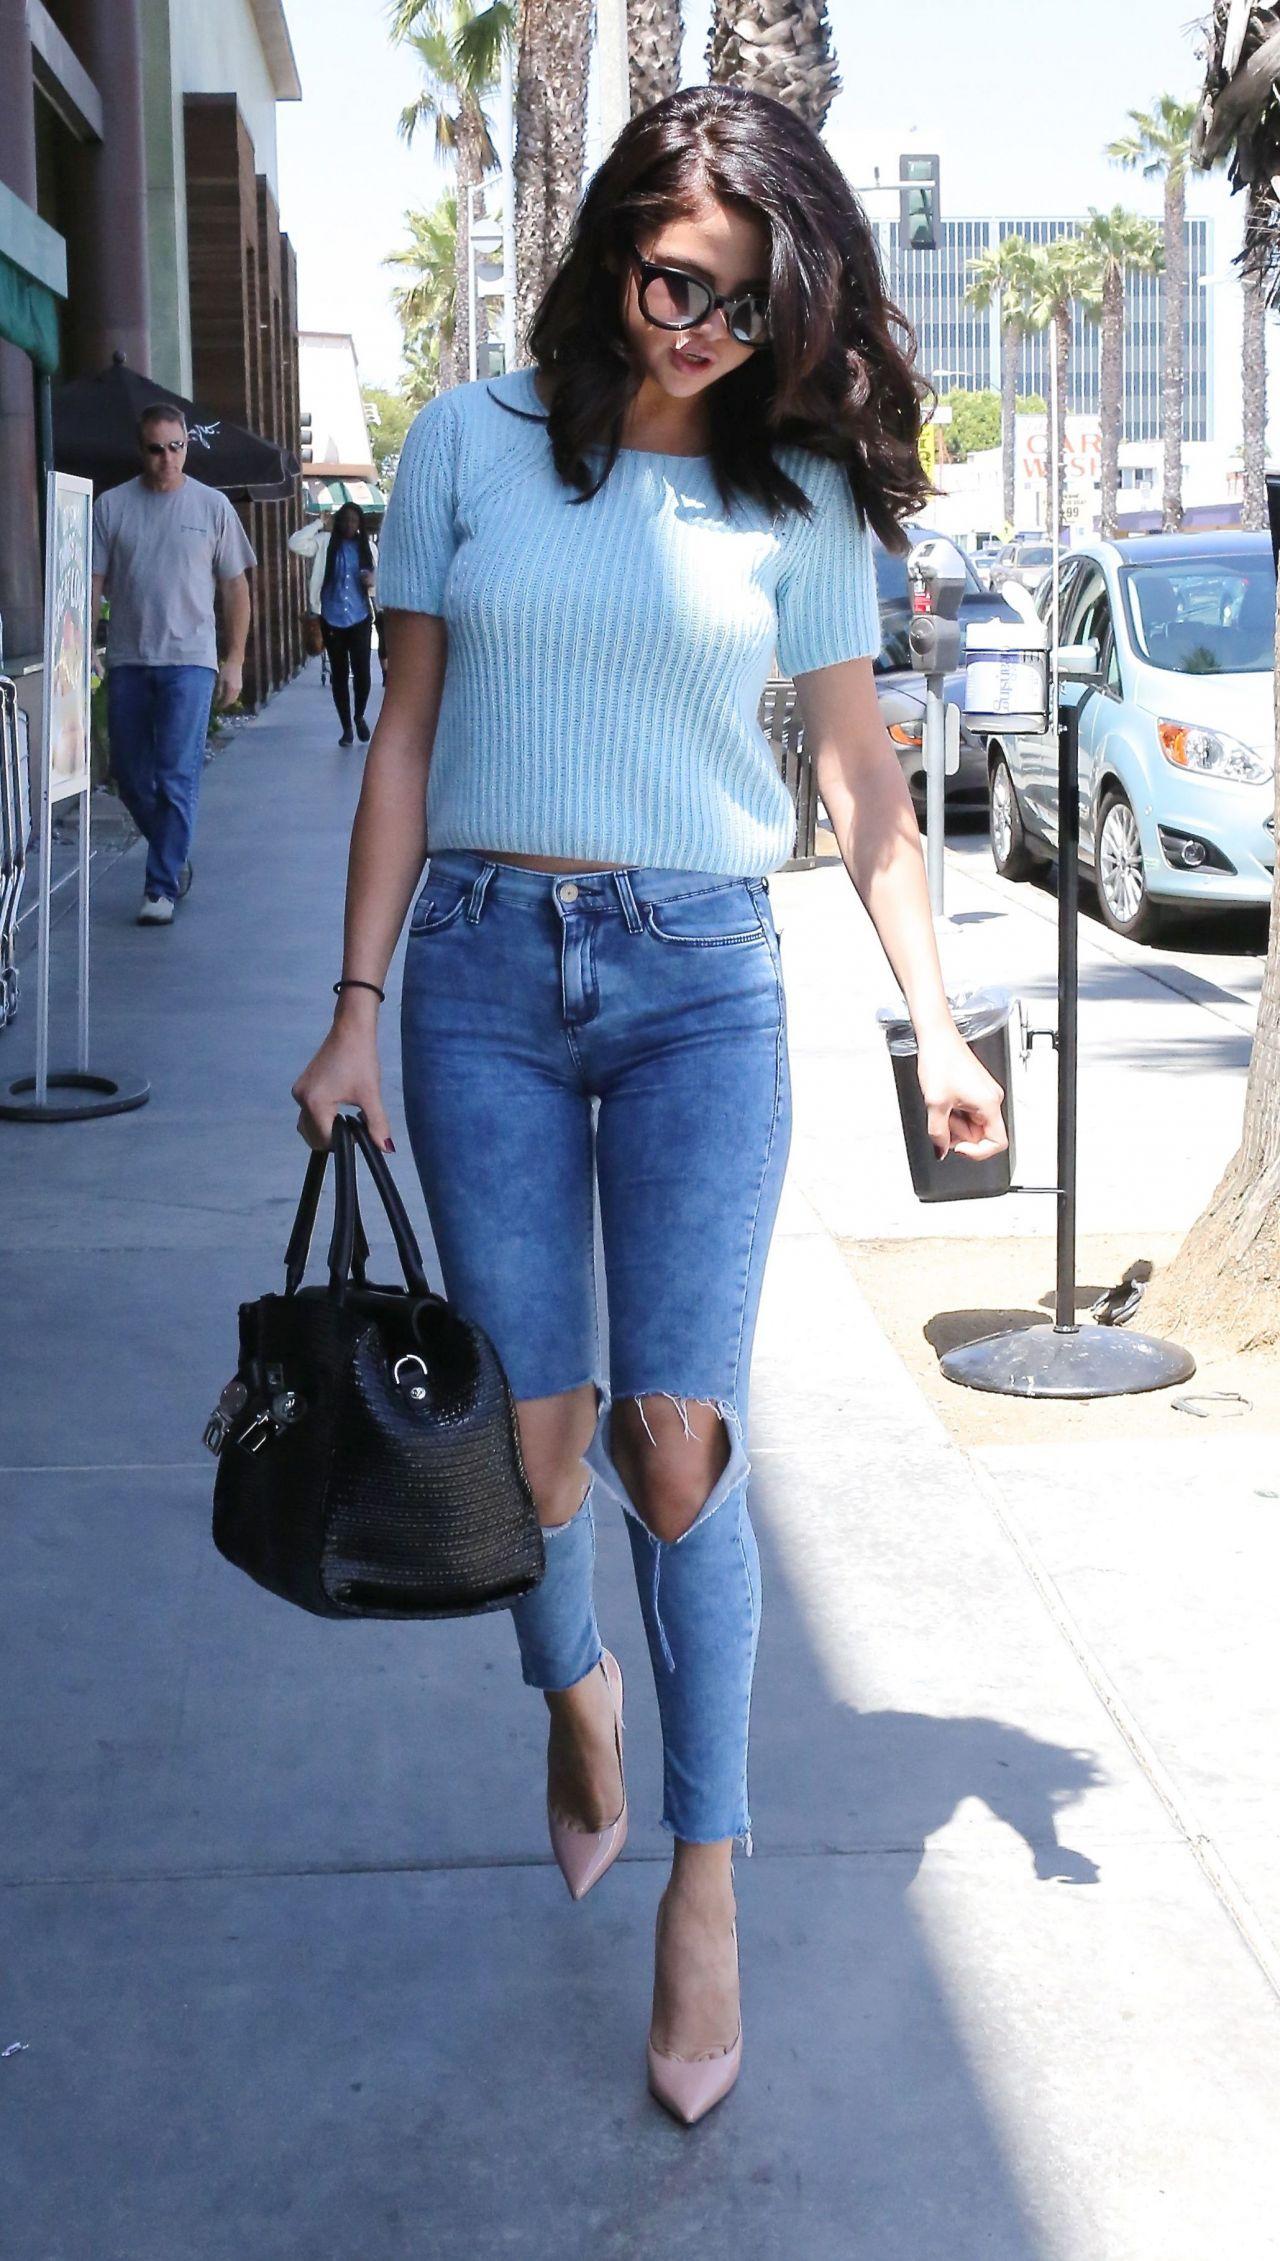 Range Rover Santa Monica >> Selena Gomez in Jeans - Out in Los Angeles - June 2014